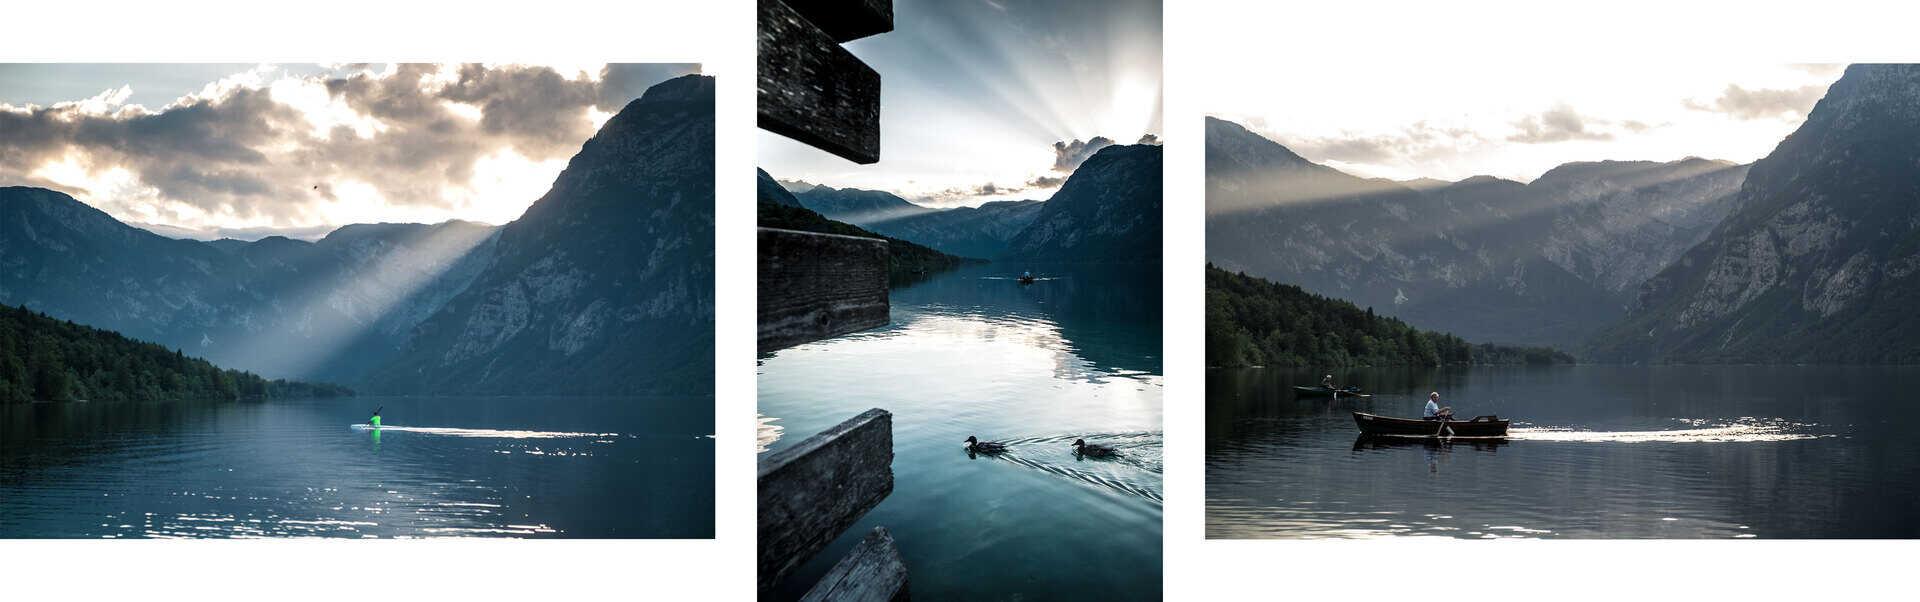 lago bohinj eslovenia